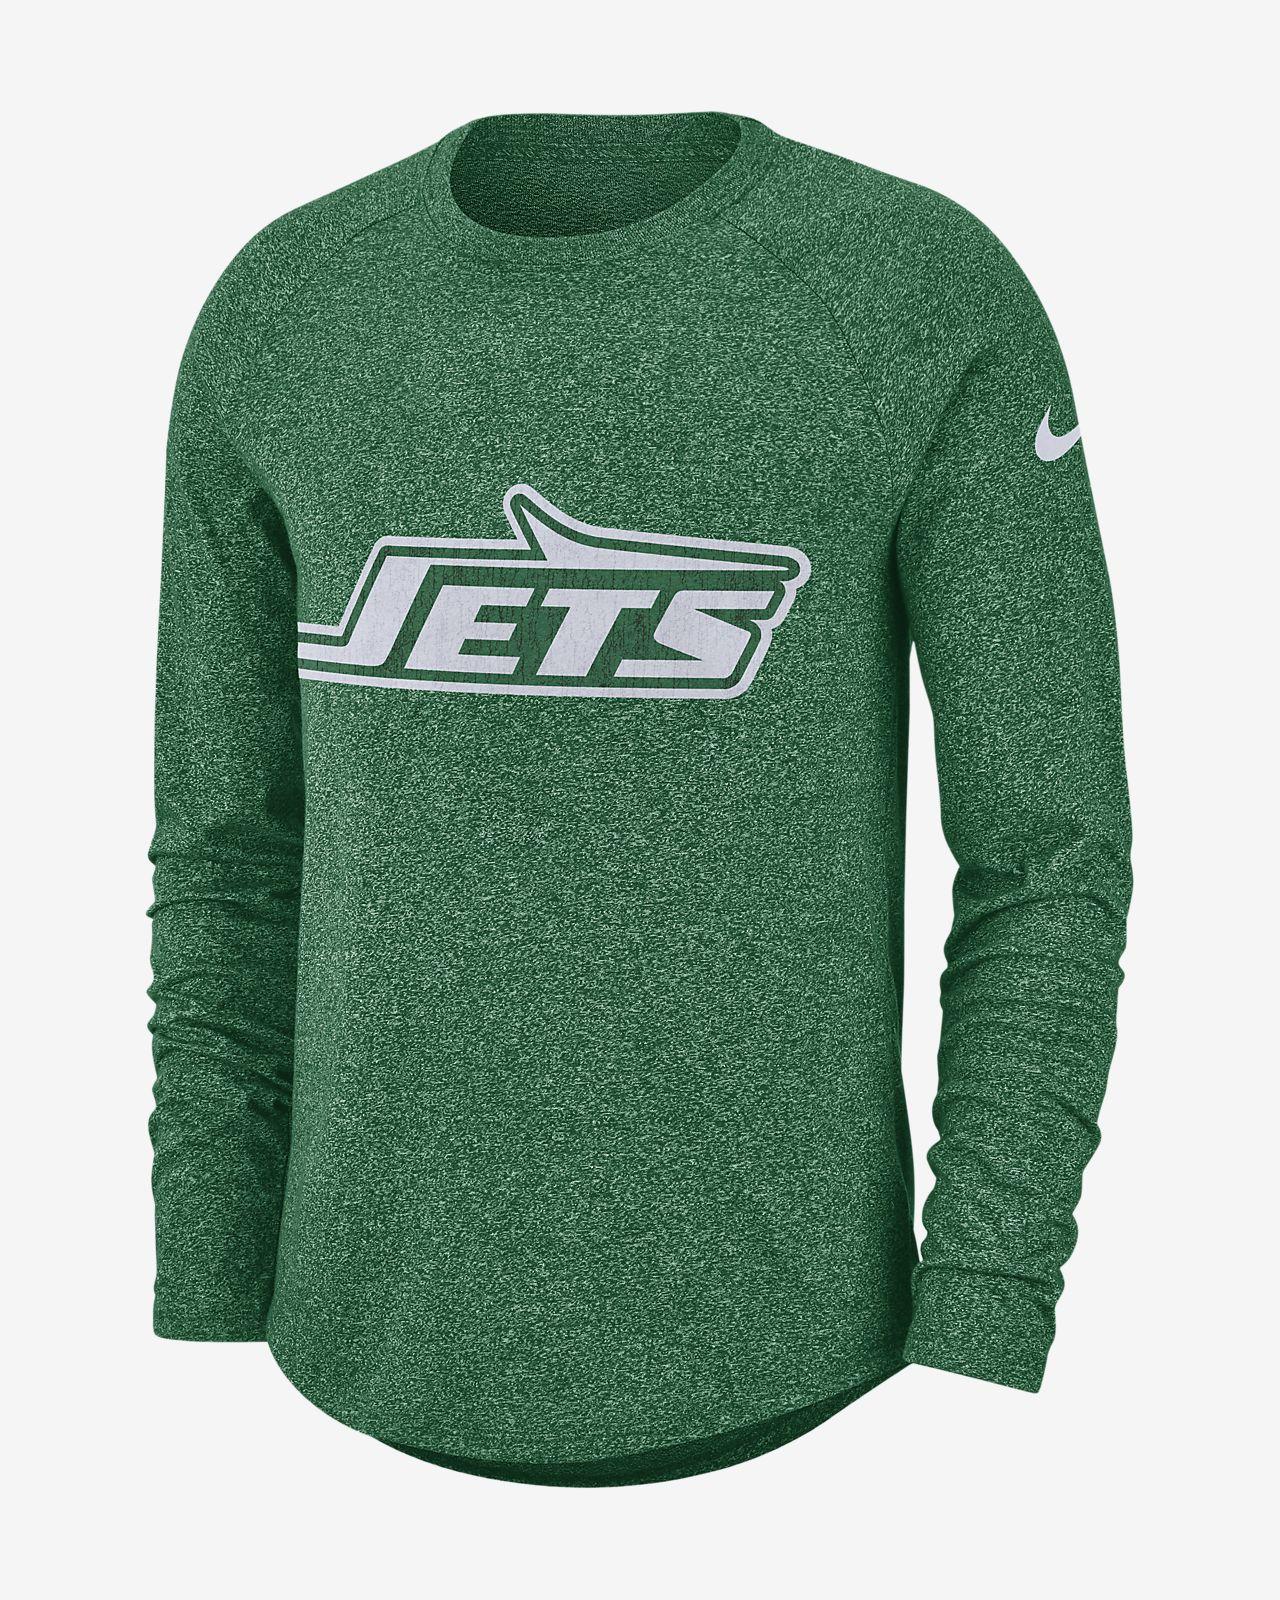 Nike Historic (NFL Jets) Men's Long-Sleeve T-Shirt